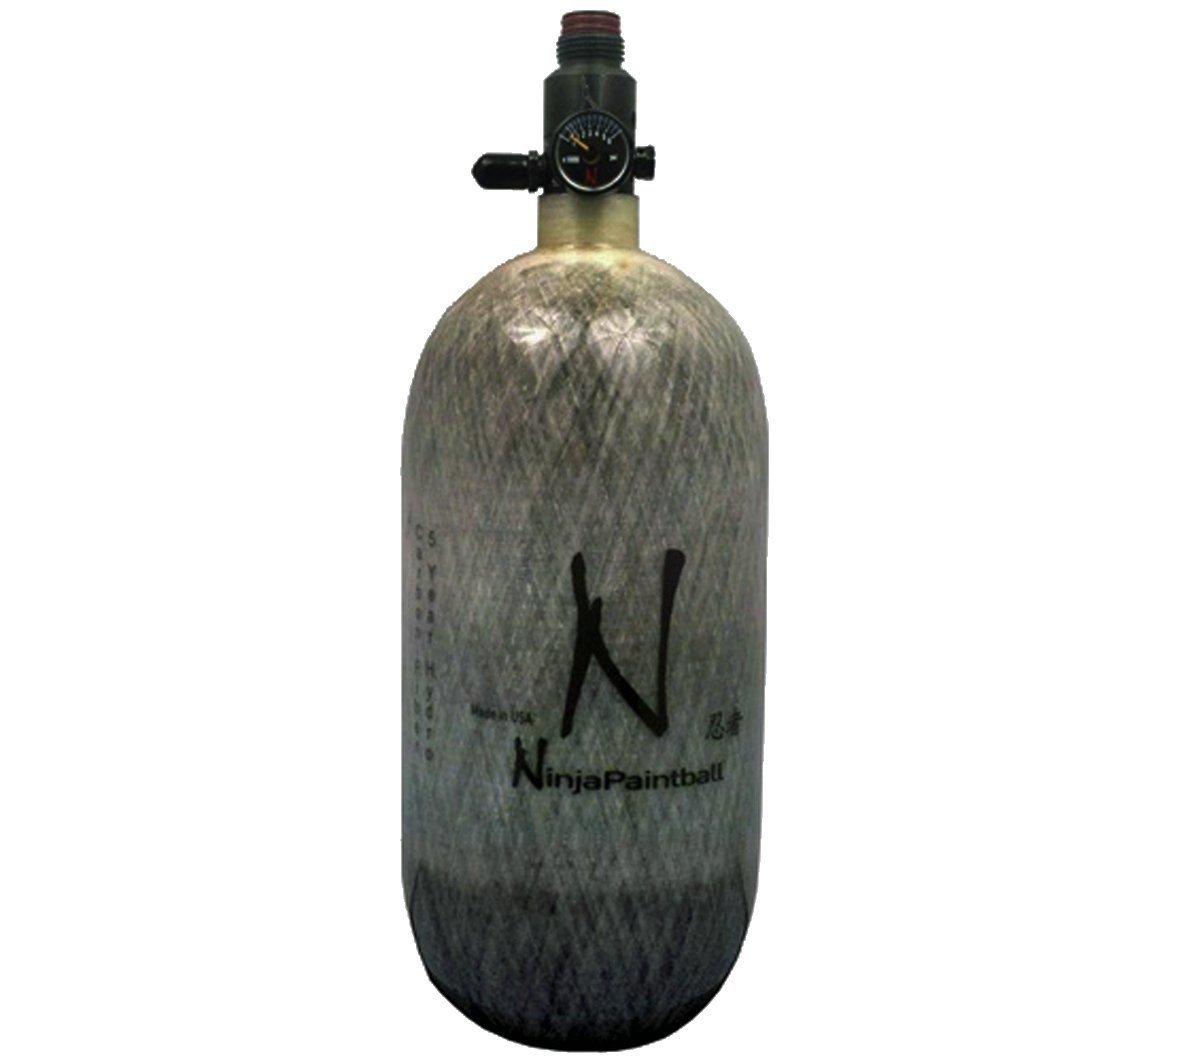 Ninja Paintball 4500 PSI Carbon Fiber HPA Tanks w/ Regulator